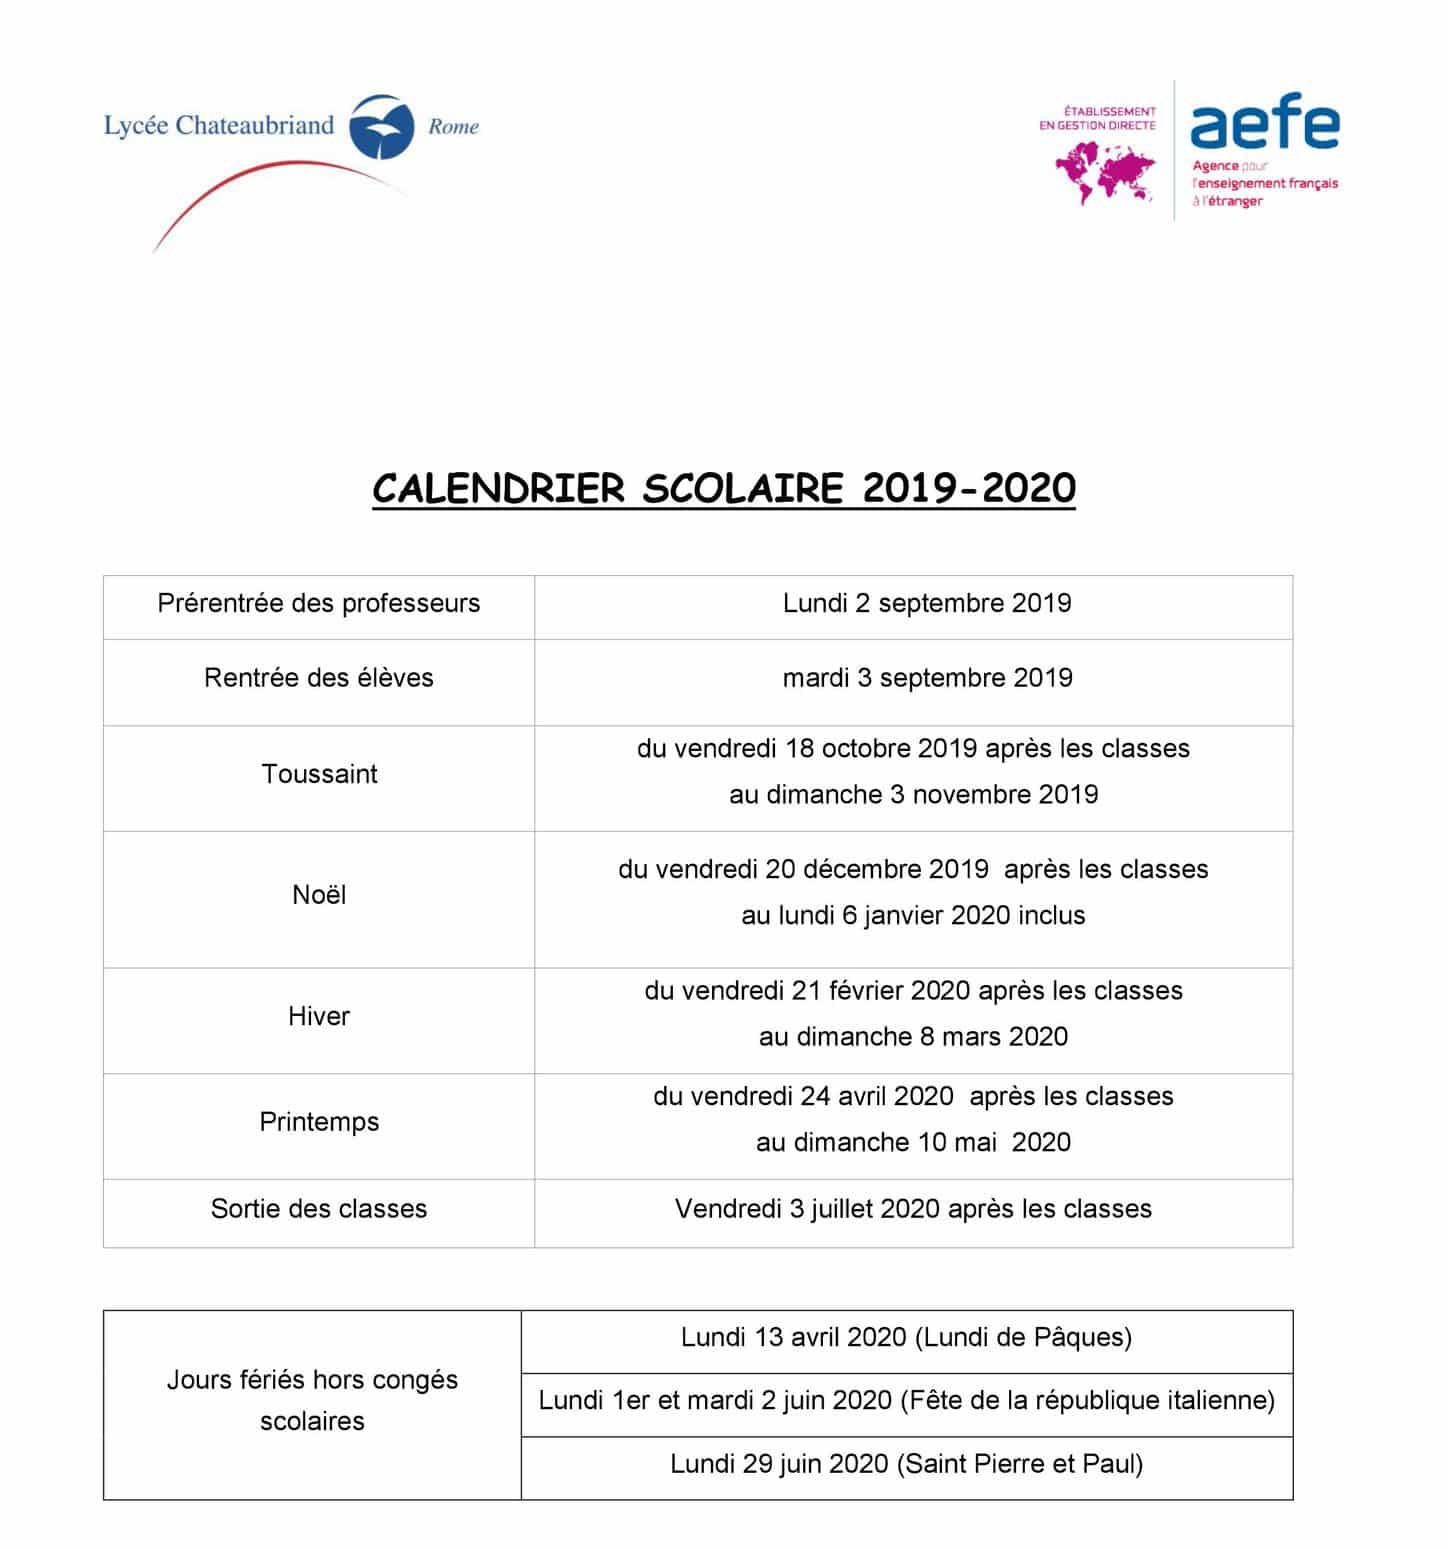 Novembre 2020 Calendario.Calendario Scolastico 2019 2020 Ape Chato Roma